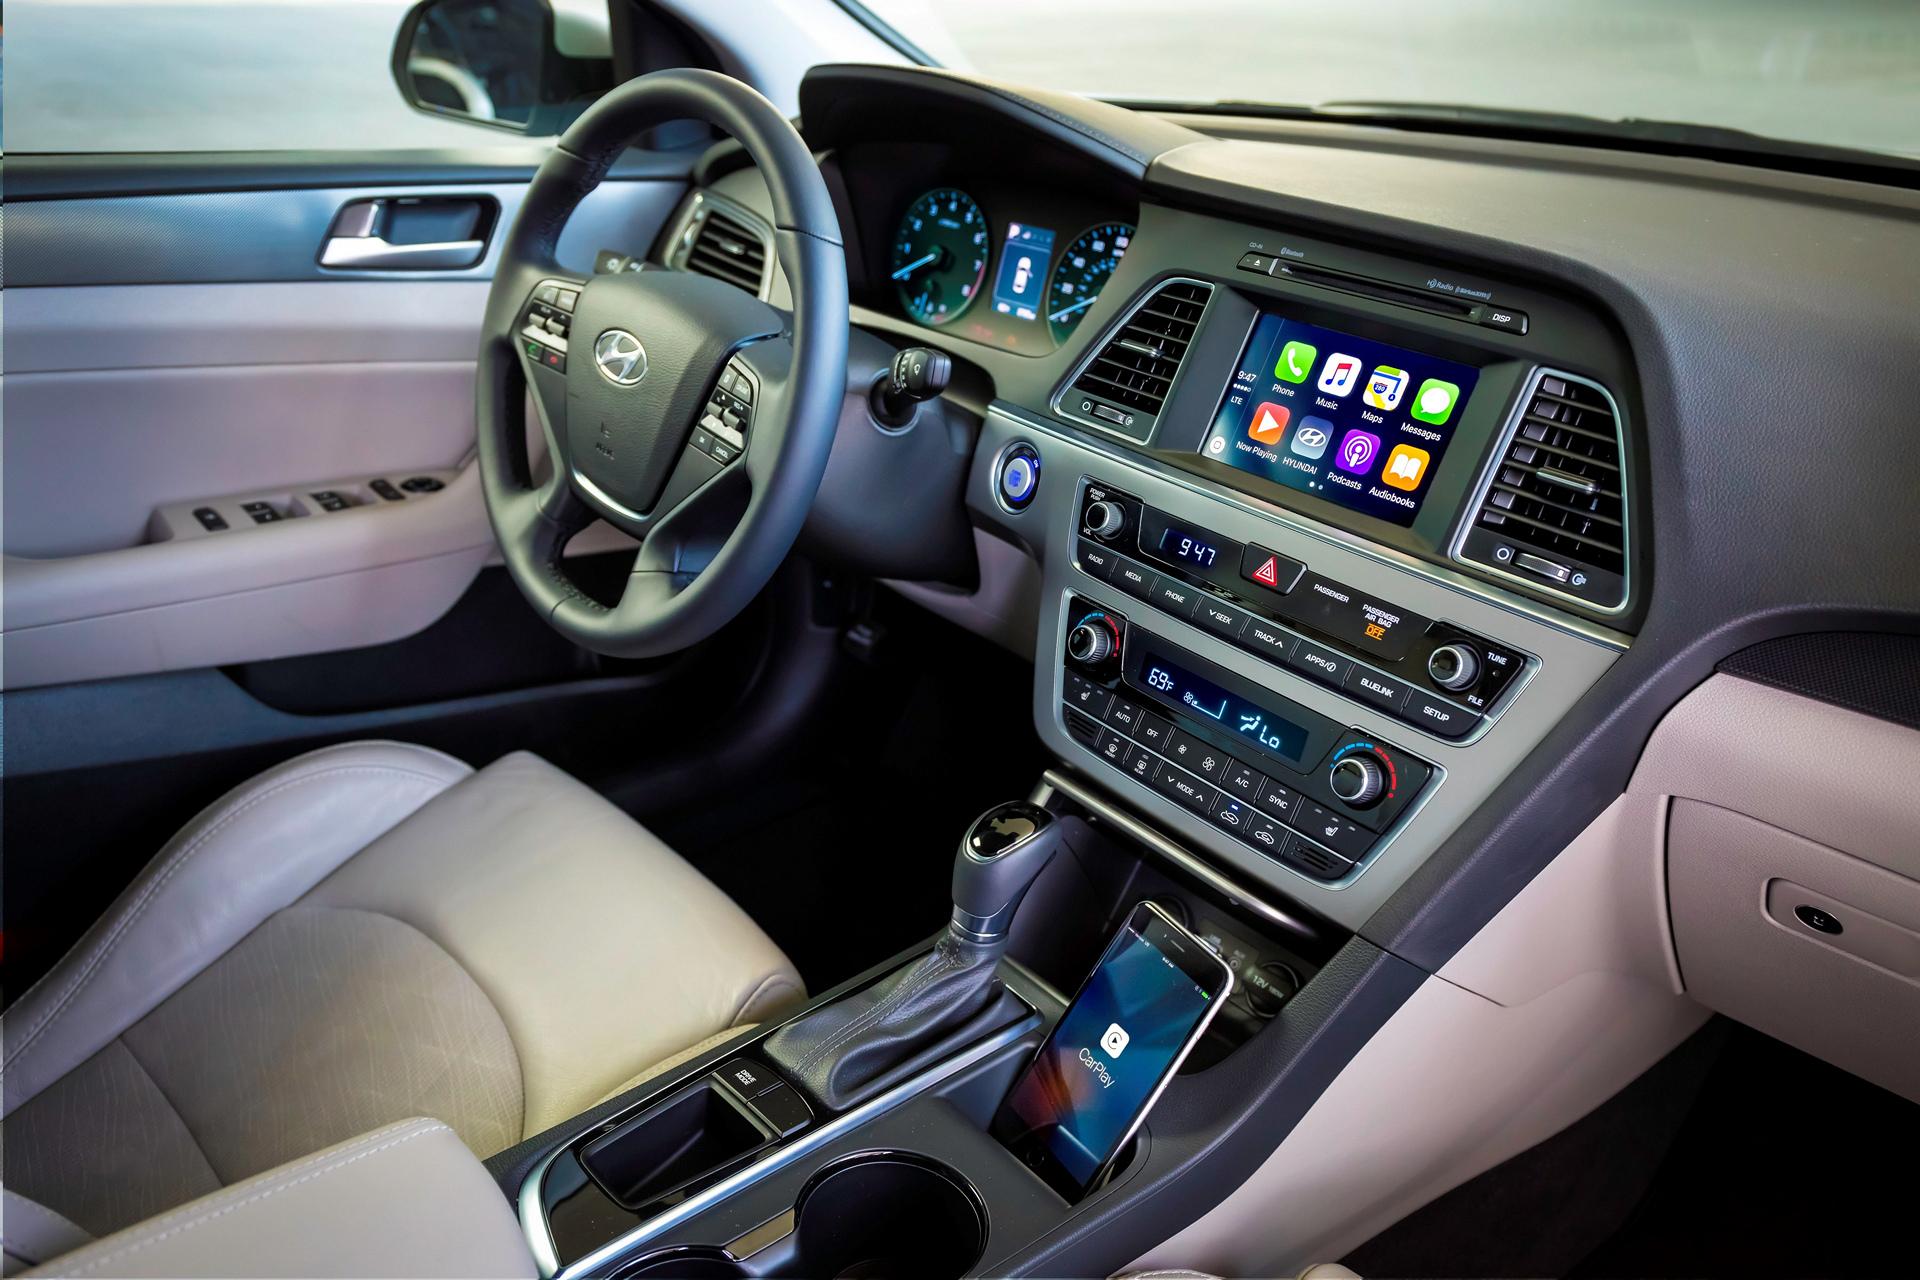 Hyundai Adds Apple Carplay Support to 2016 Sonata © Hyundai Motor Company